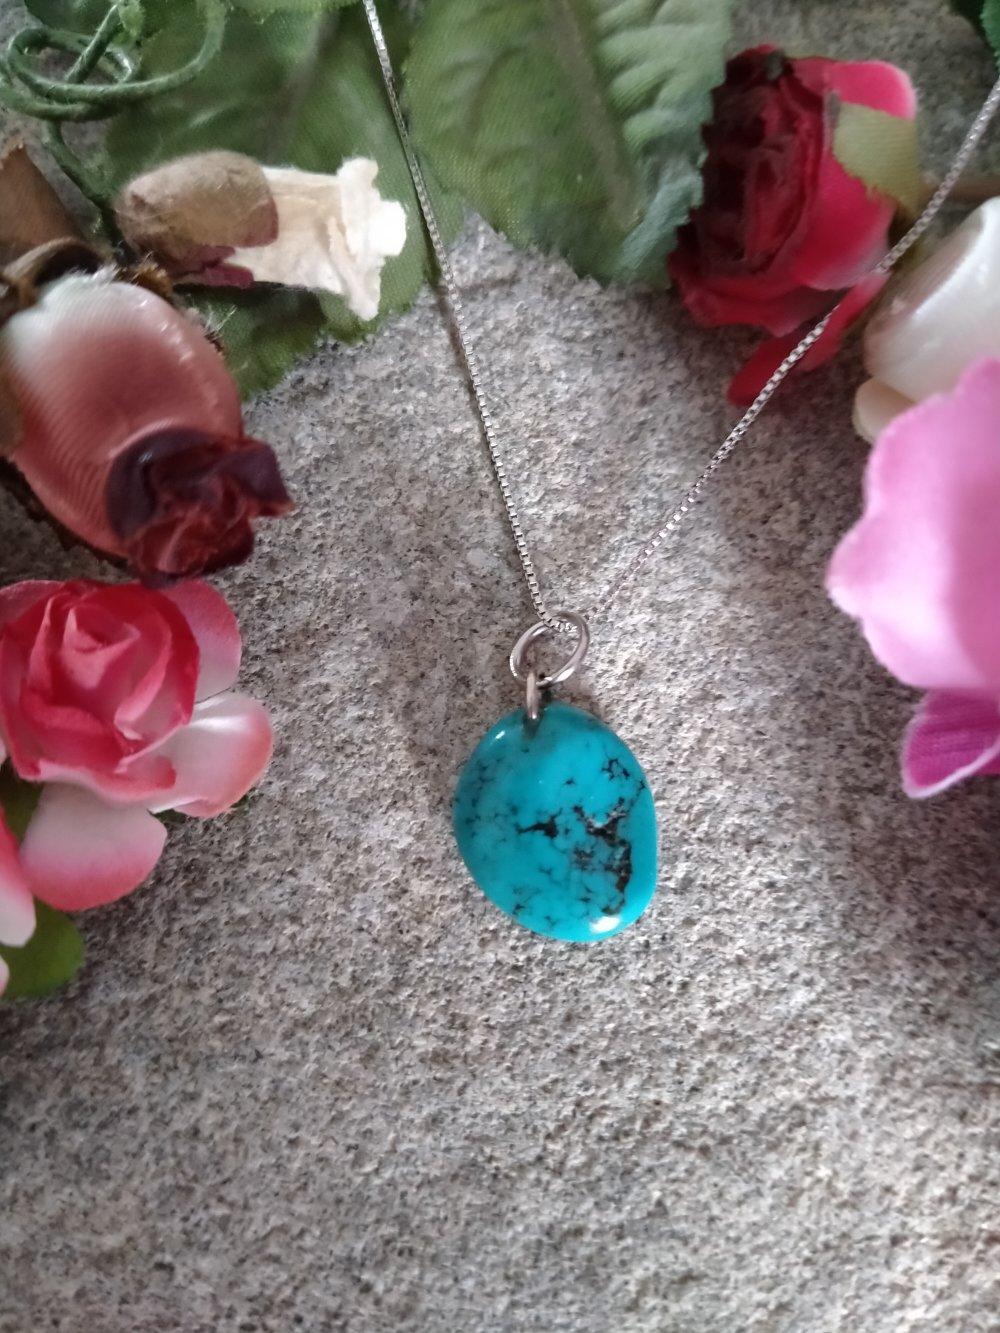 collier pendentif turquoise, collier pendentif pierre naturelle